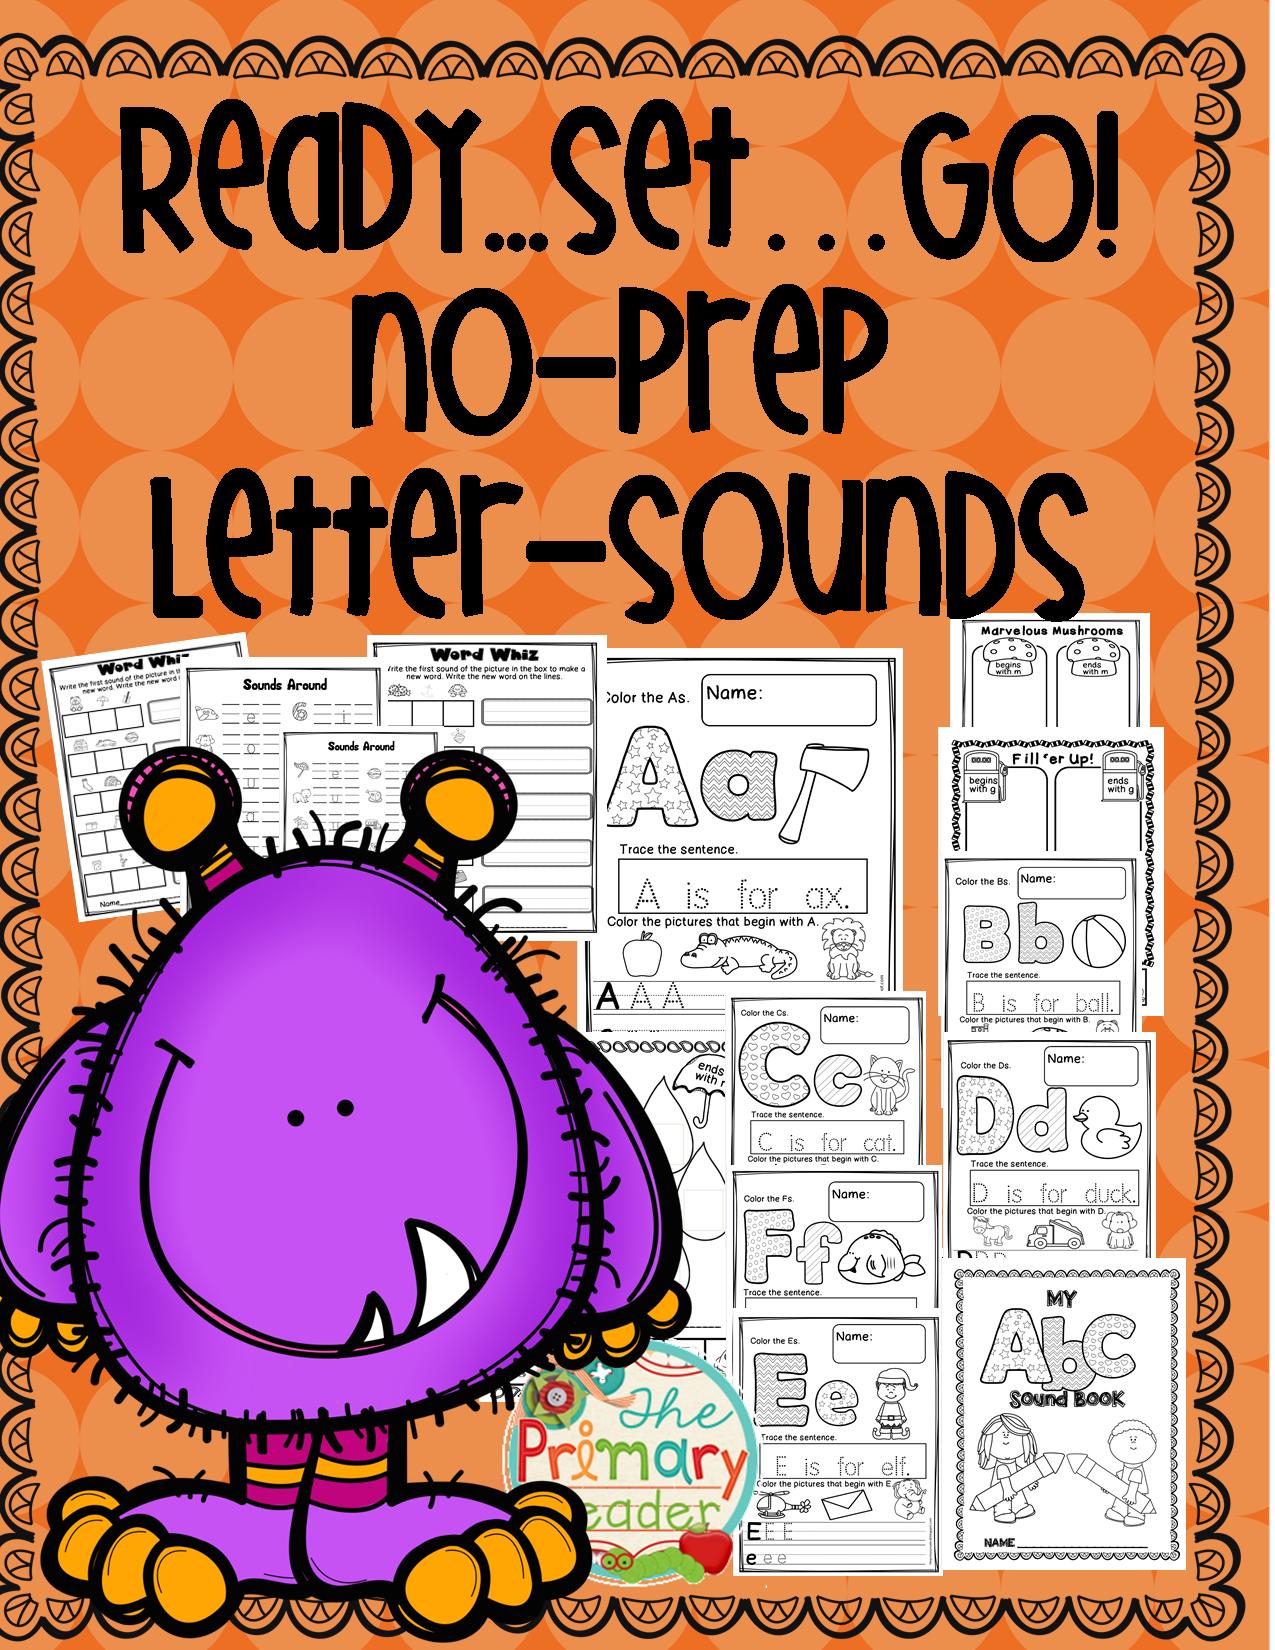 NO PREP PRINTABLES LETTER SOUNDS Letter sounds